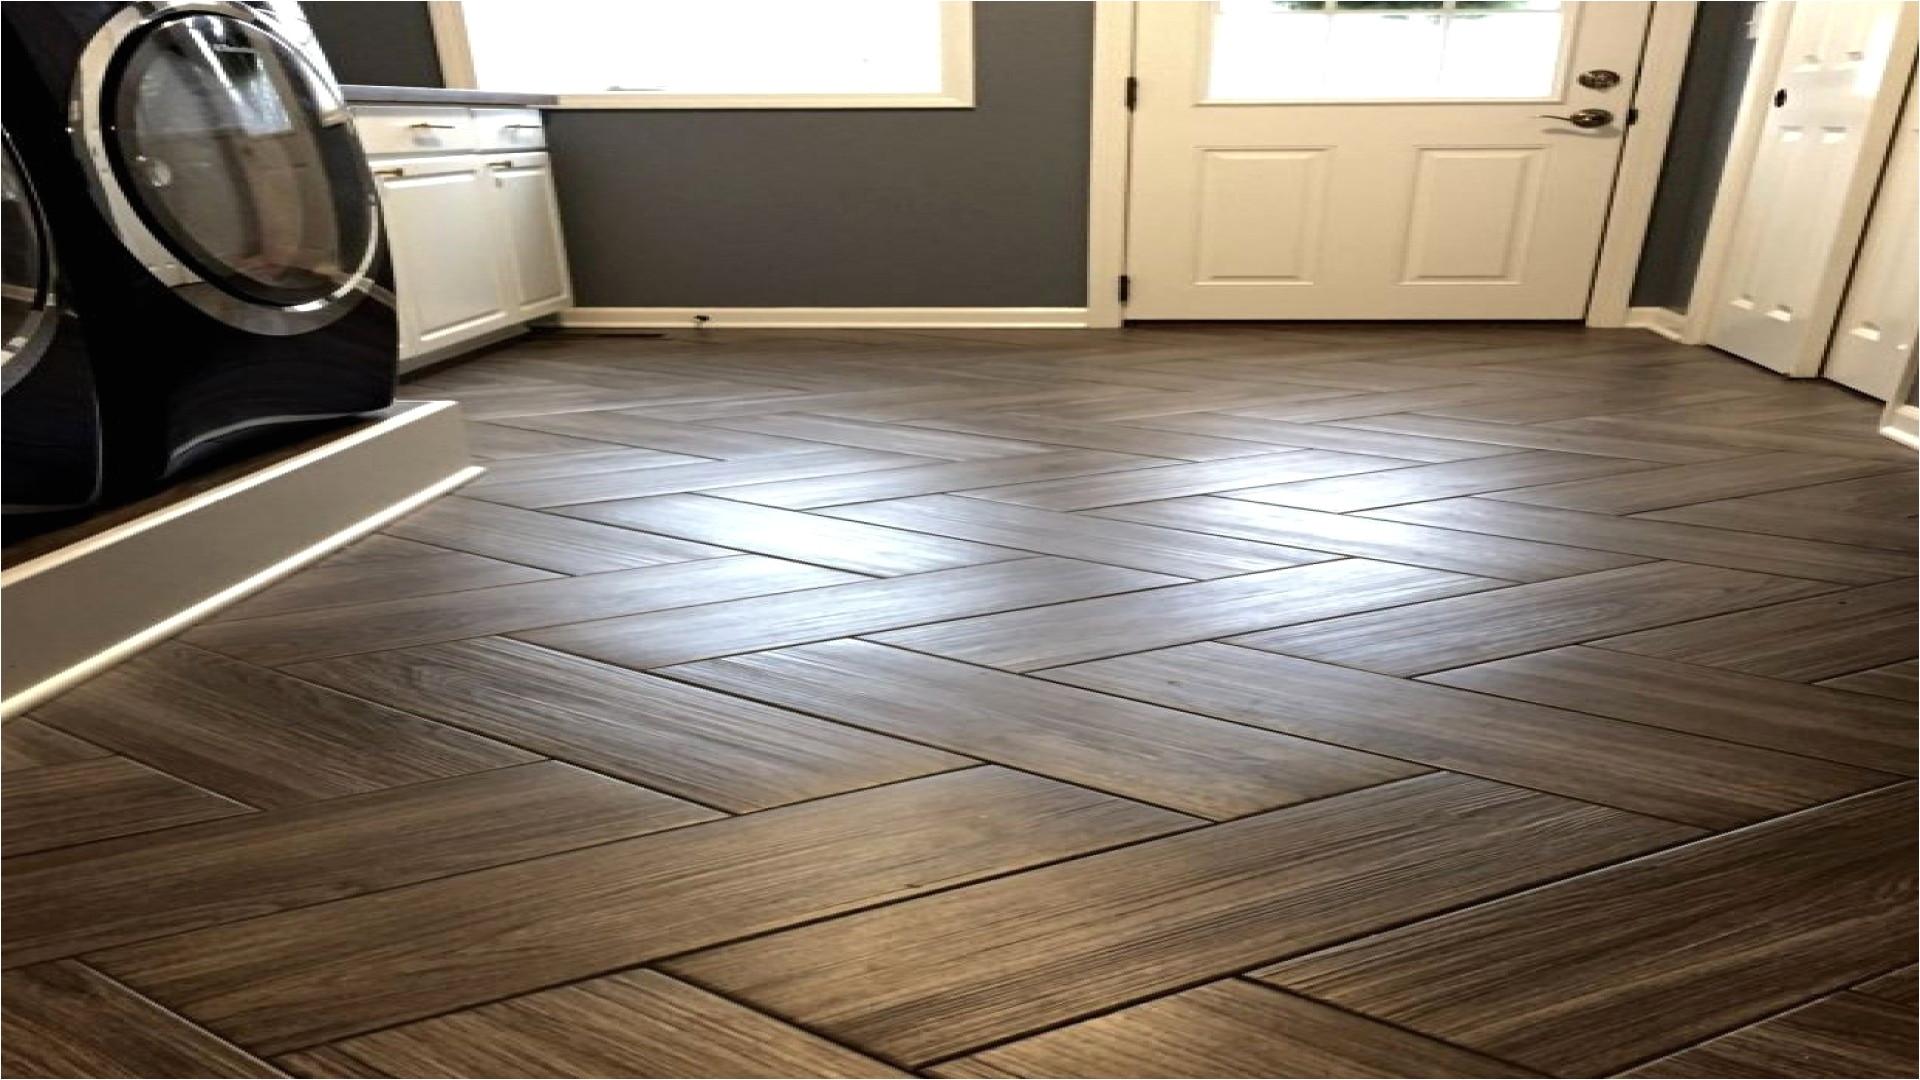 hardwood floor with tile of porcelain floor tile home depot bradshomefurnishings within home depot kitchen floor tile 50 luxury home depot stick floor tiles